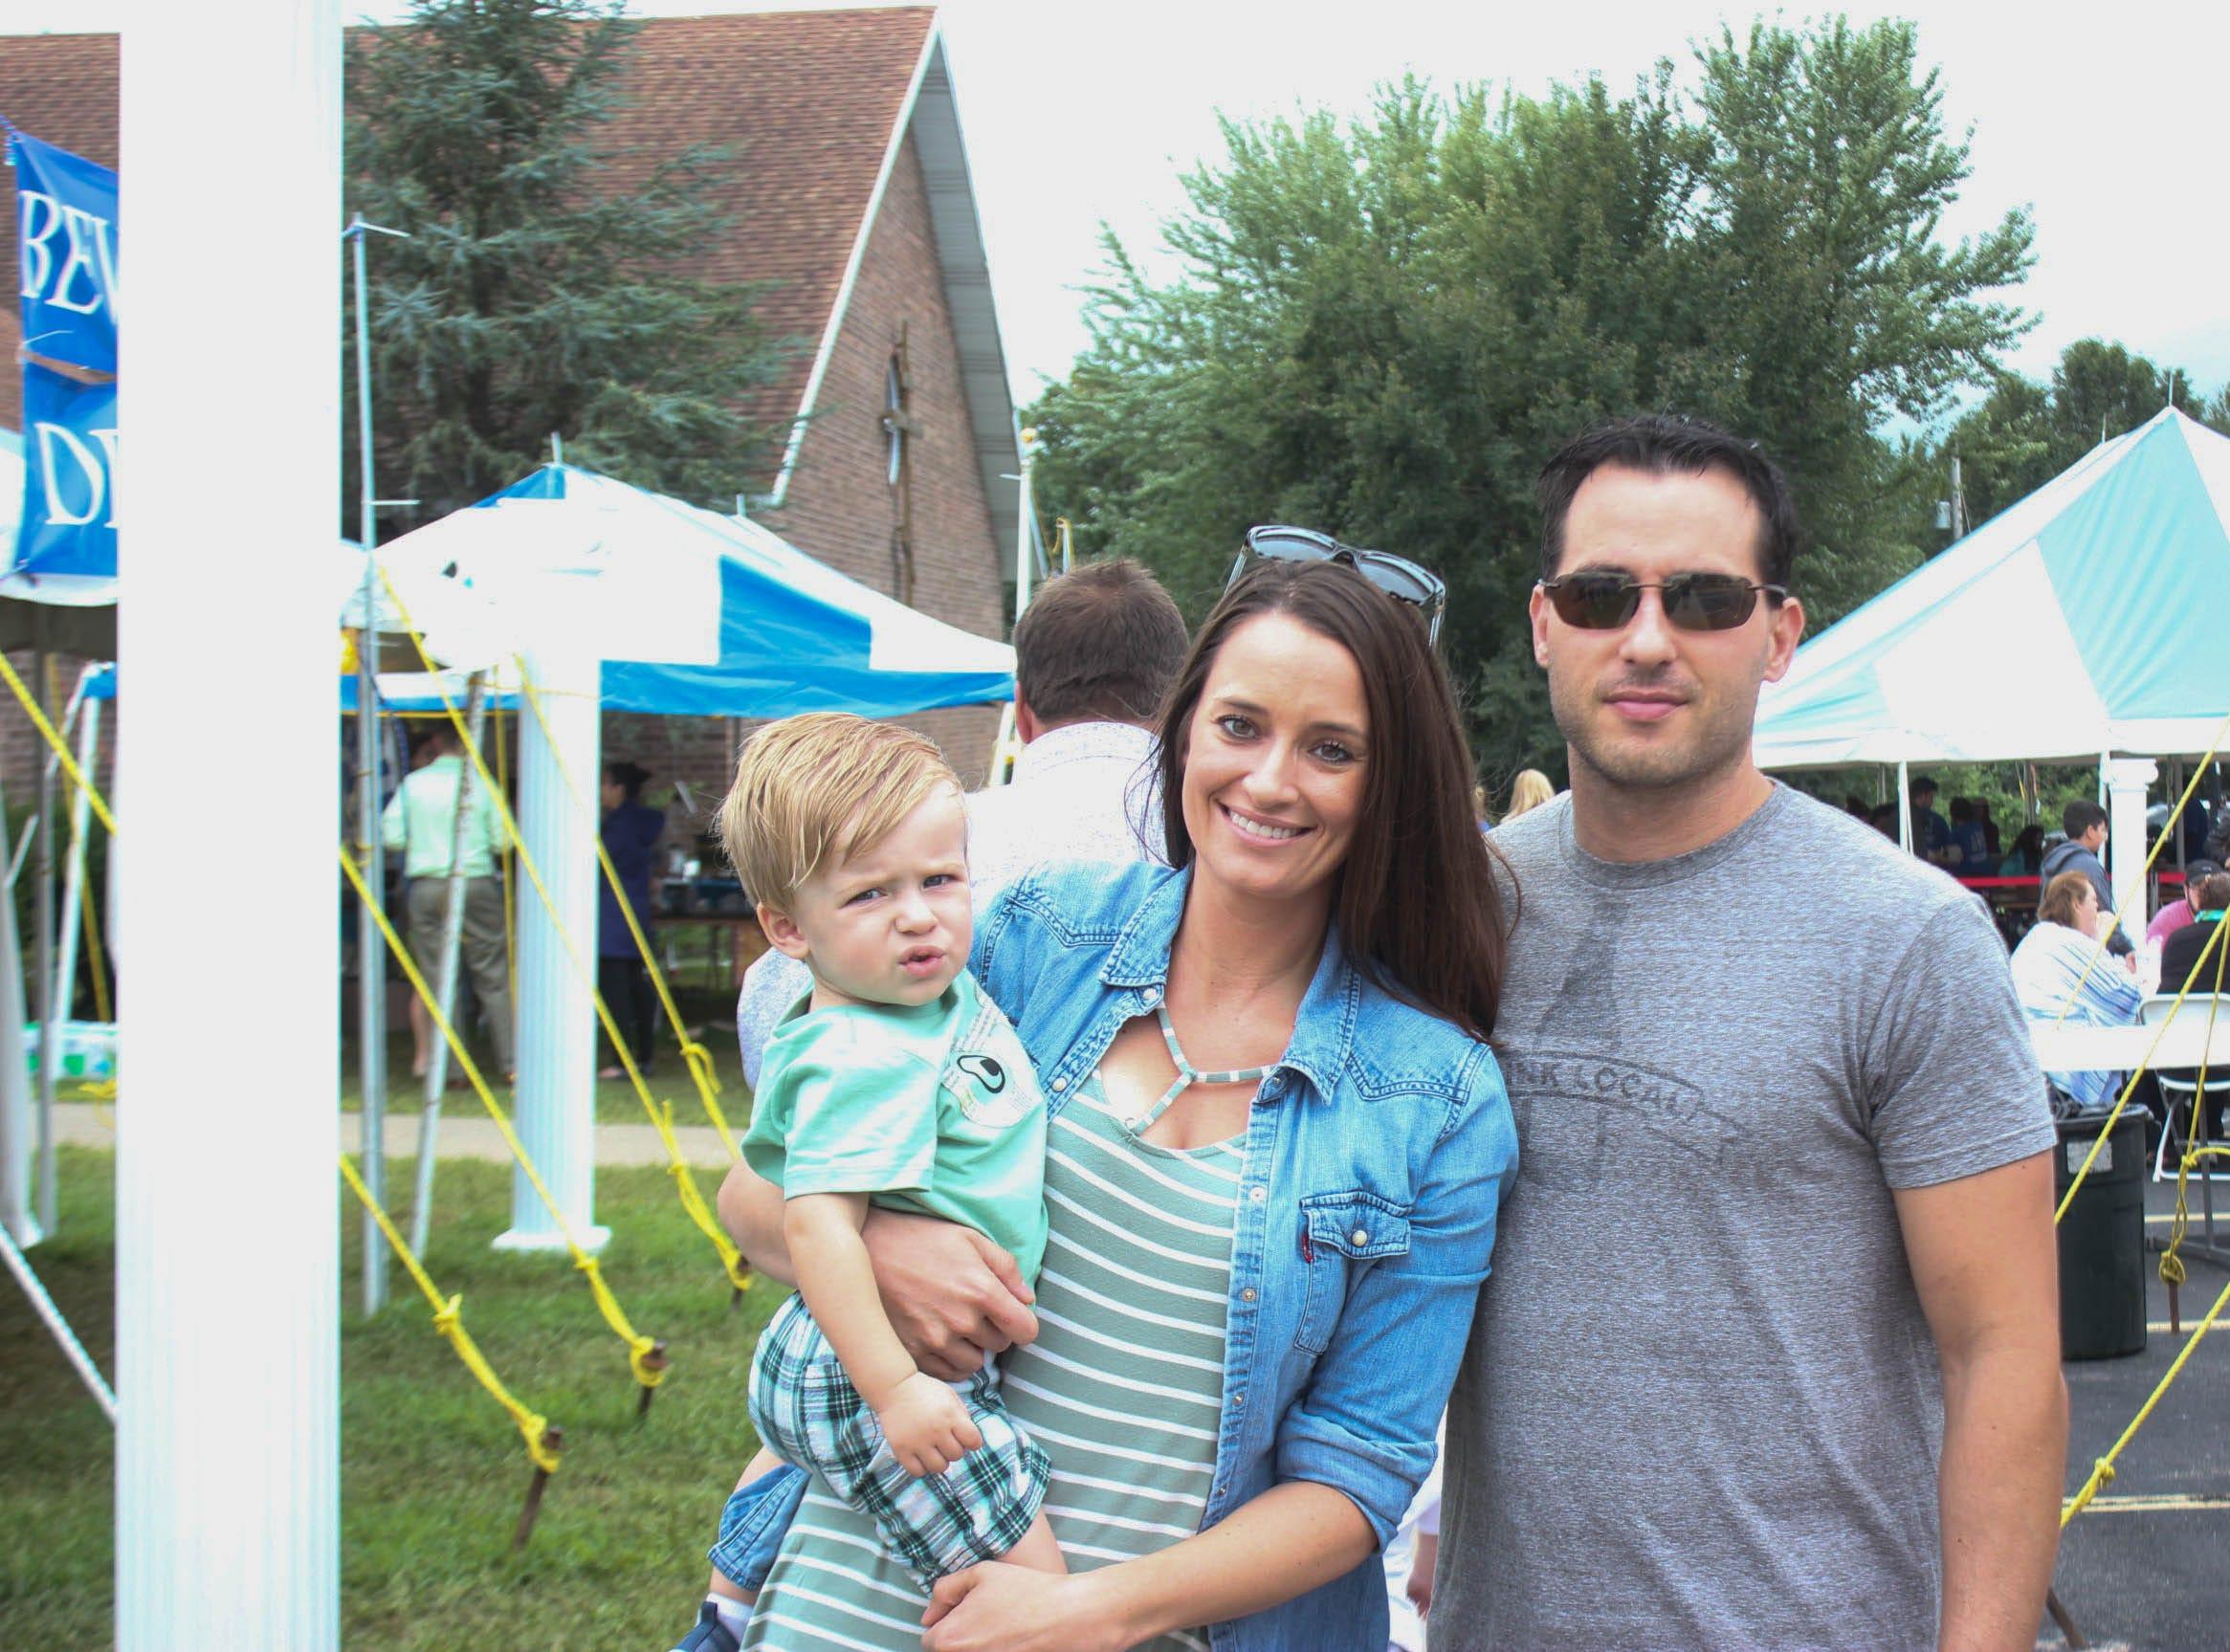 Elias Regier, Lydia Regier and Chris Regier